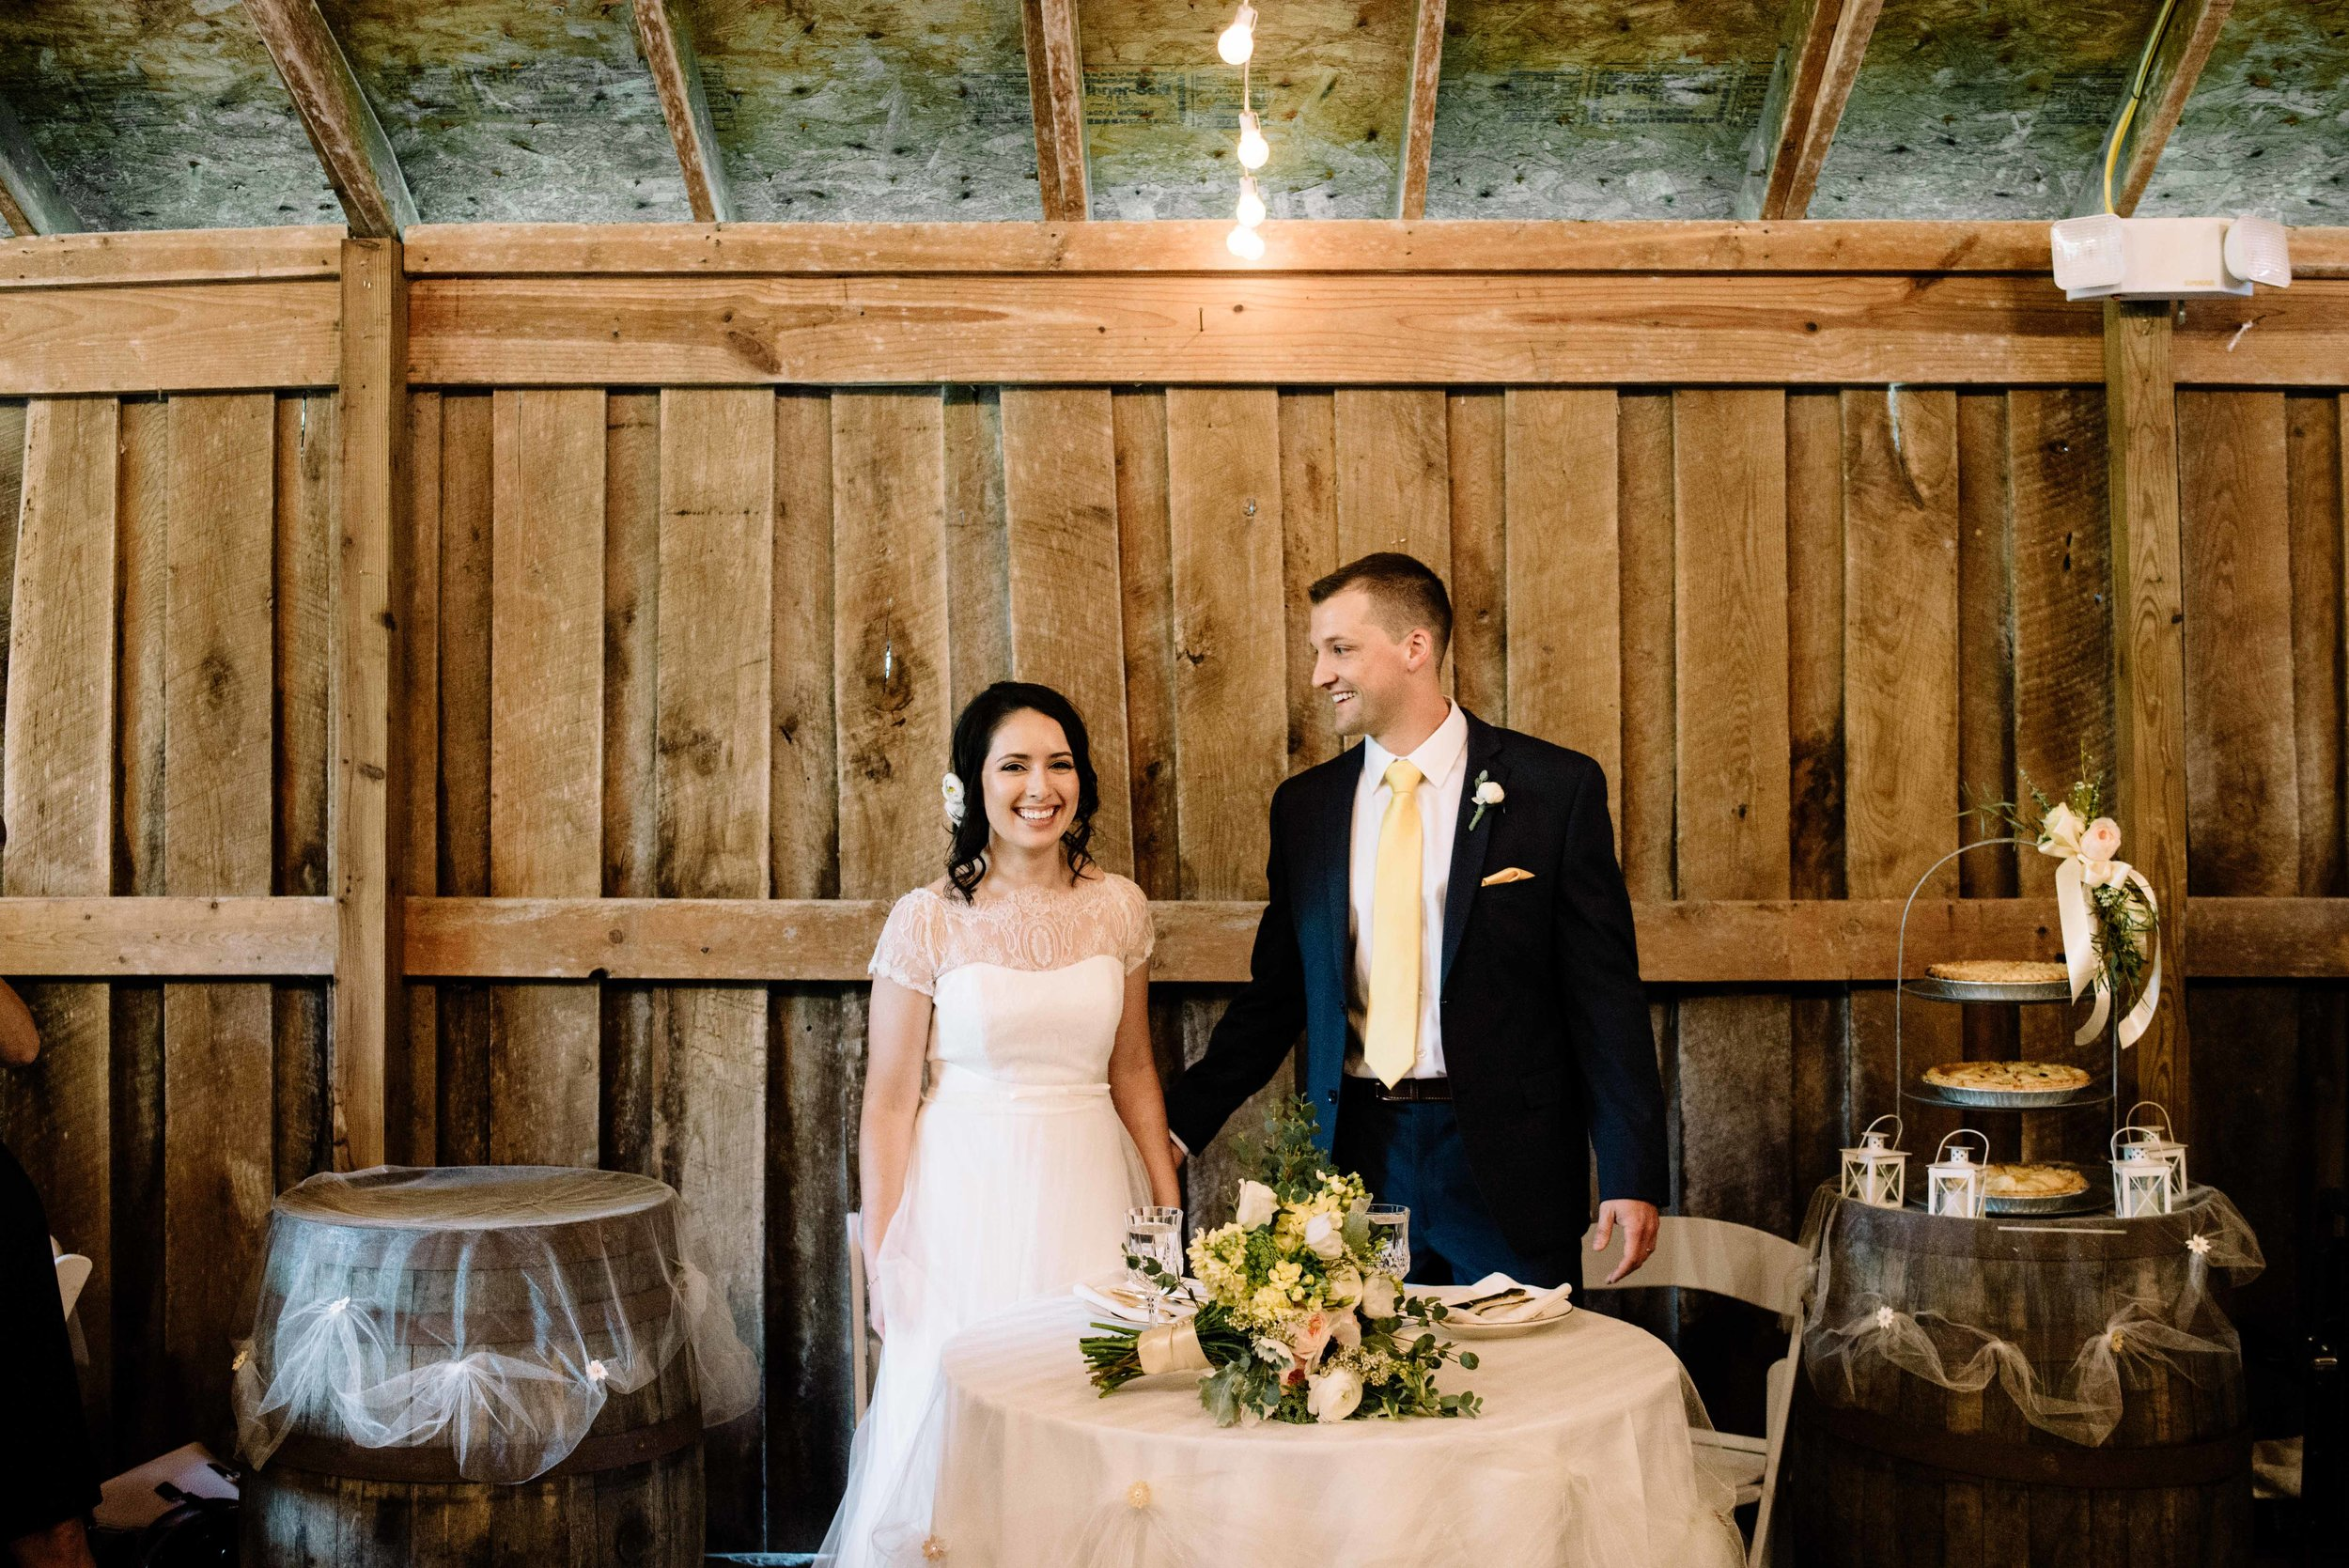 Ana-Dan-Blog-Indianapolis-Wedding-78.jpg